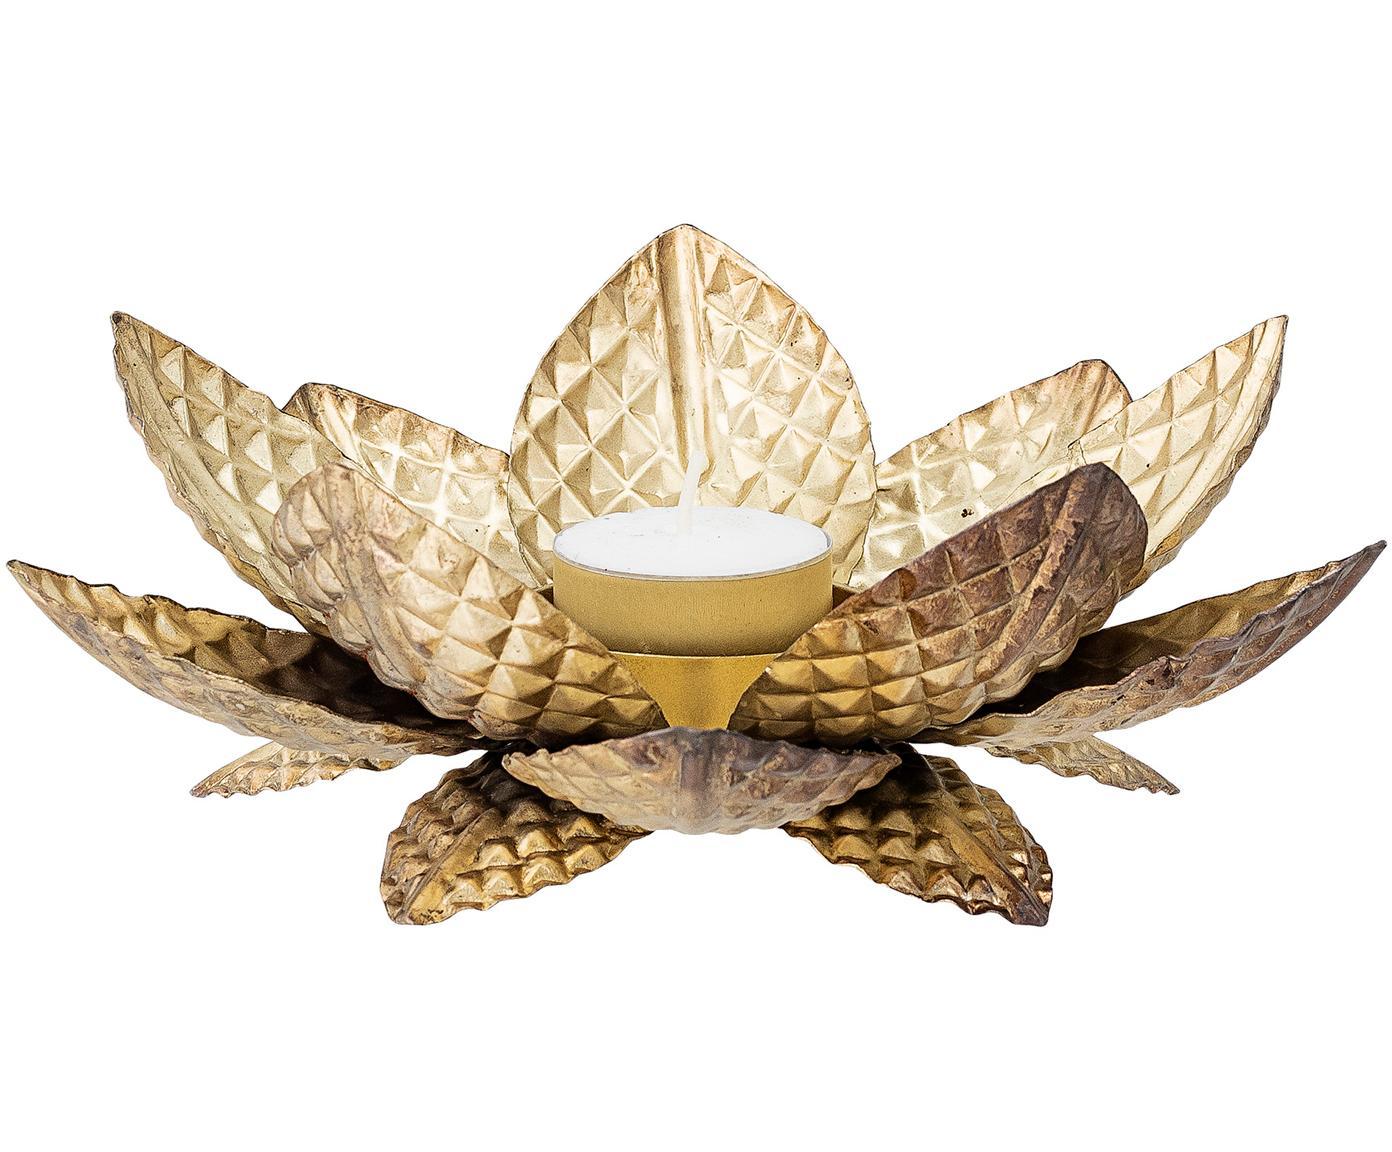 Teelichthalter Lotus, Metall, beschichtet, Messingfarben, Ø 20 cm x H 7 cm